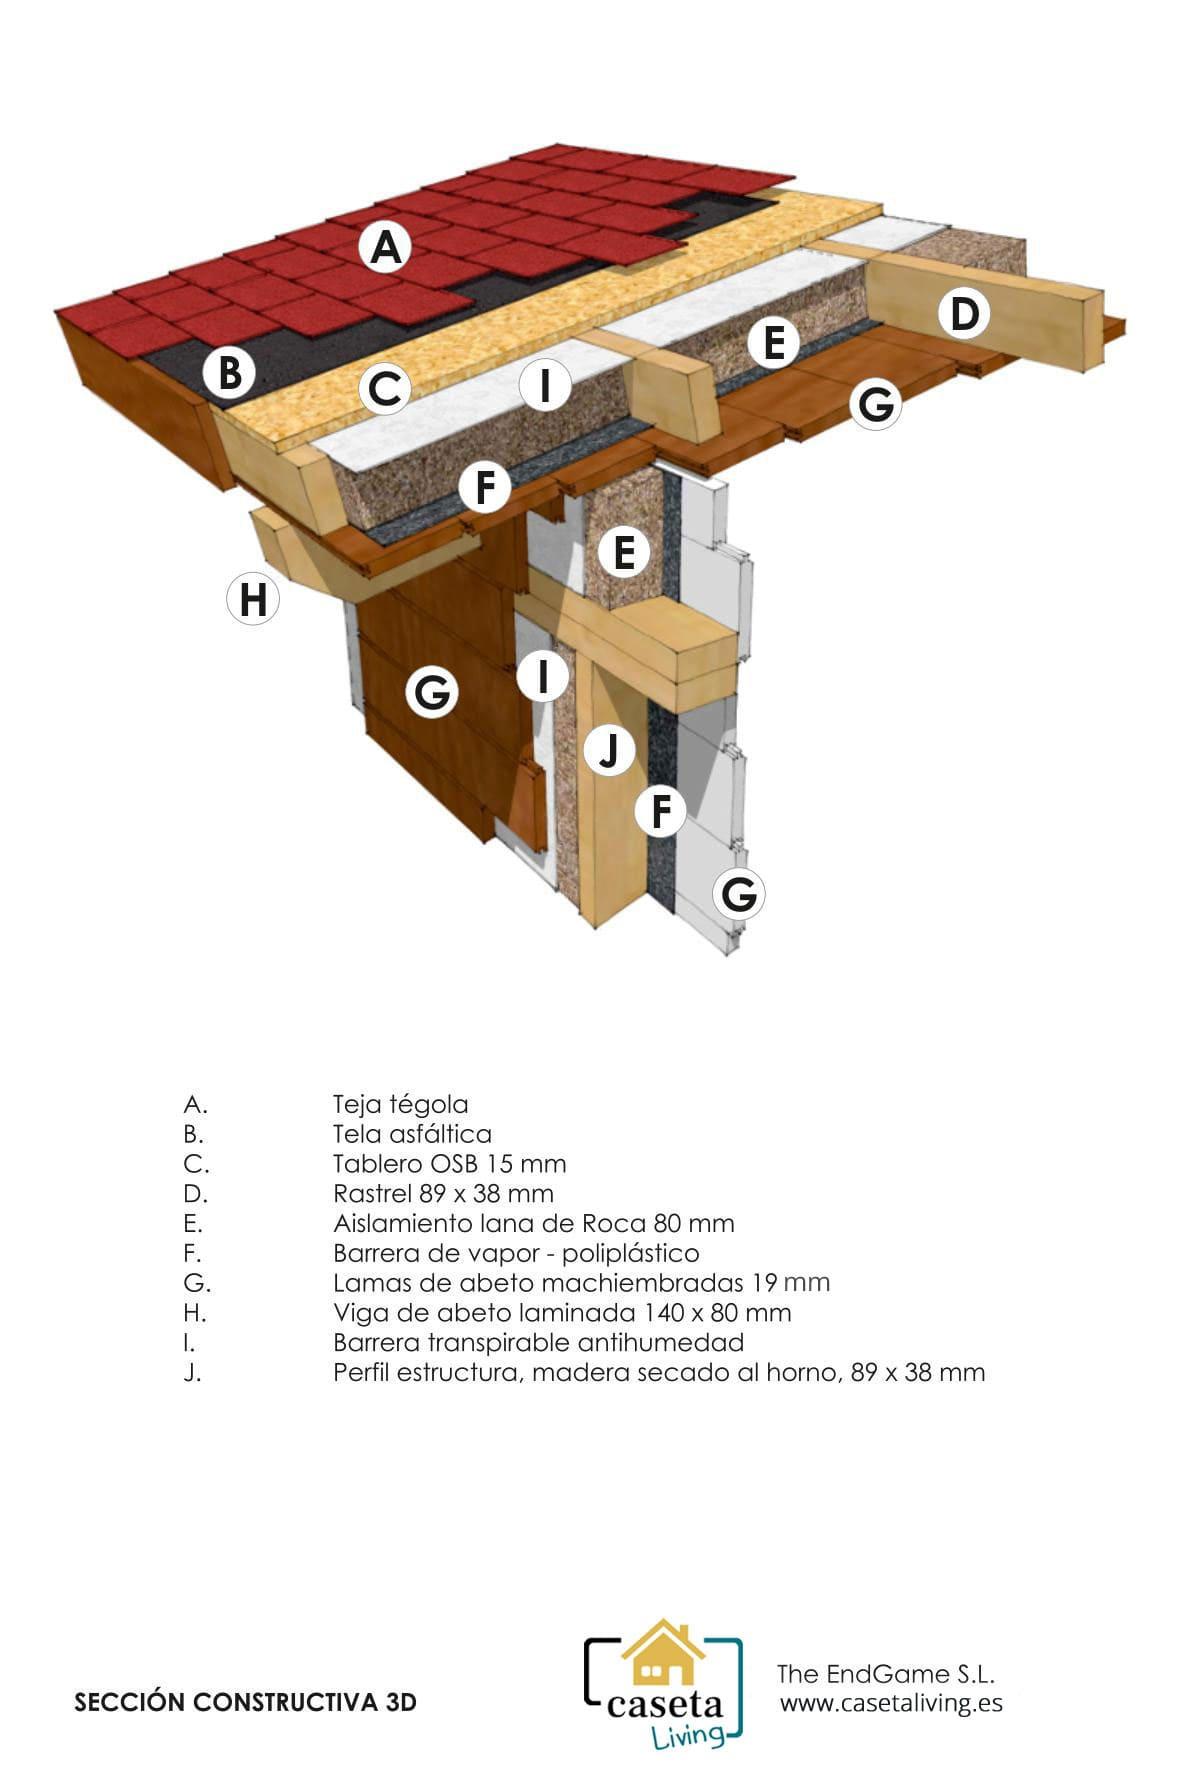 Sistema constructivo canadiense 4 Caseta Living